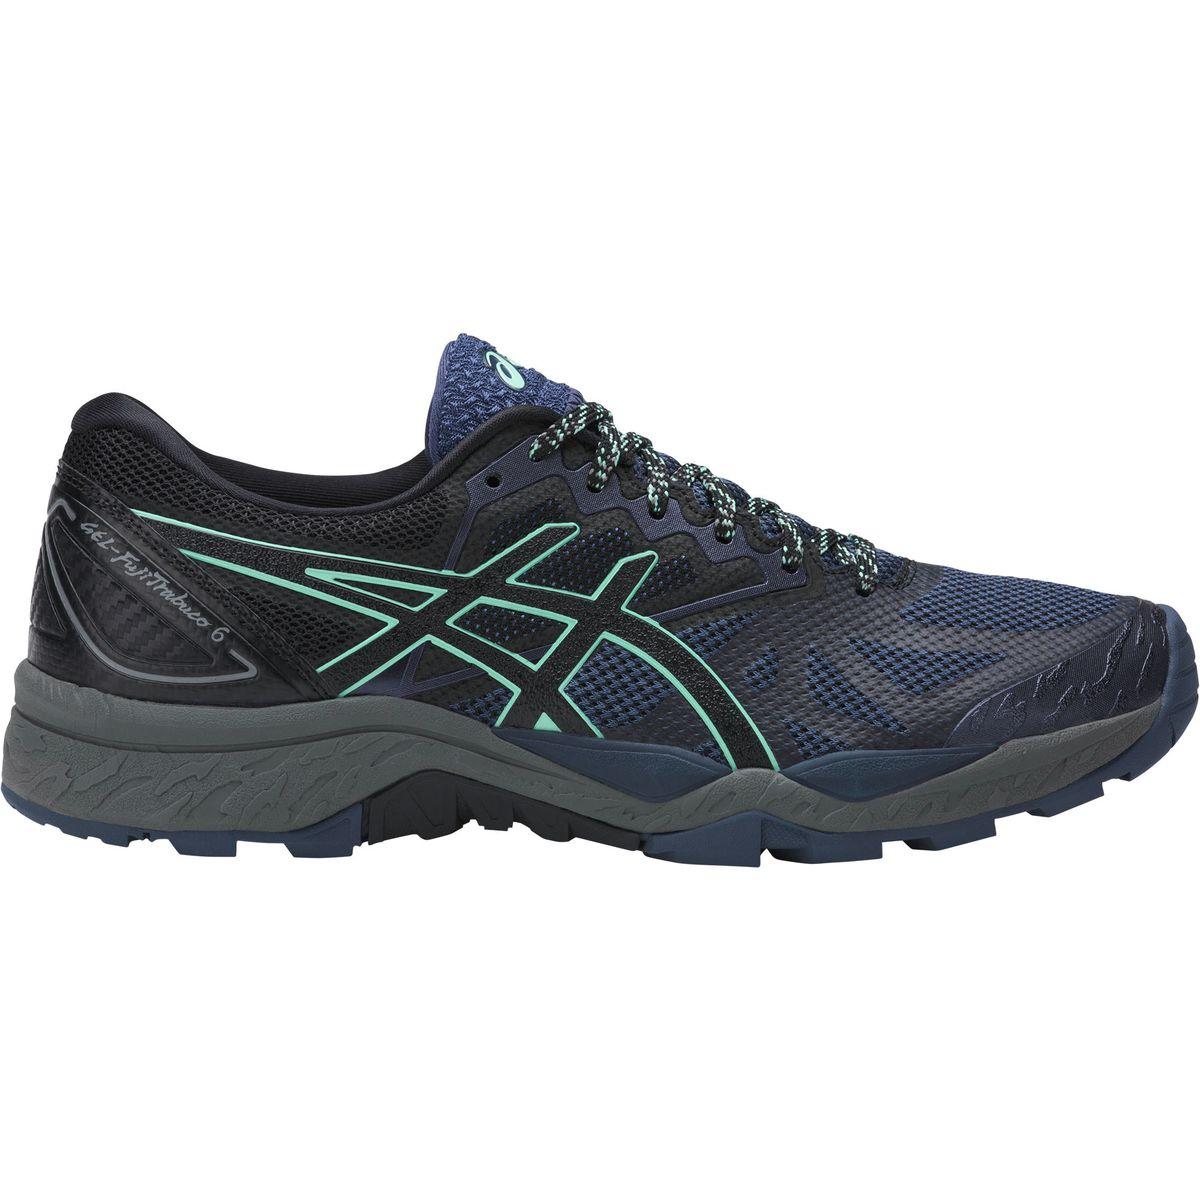 photo: Asics GEL-Fujitrabuco 6 trail running shoe